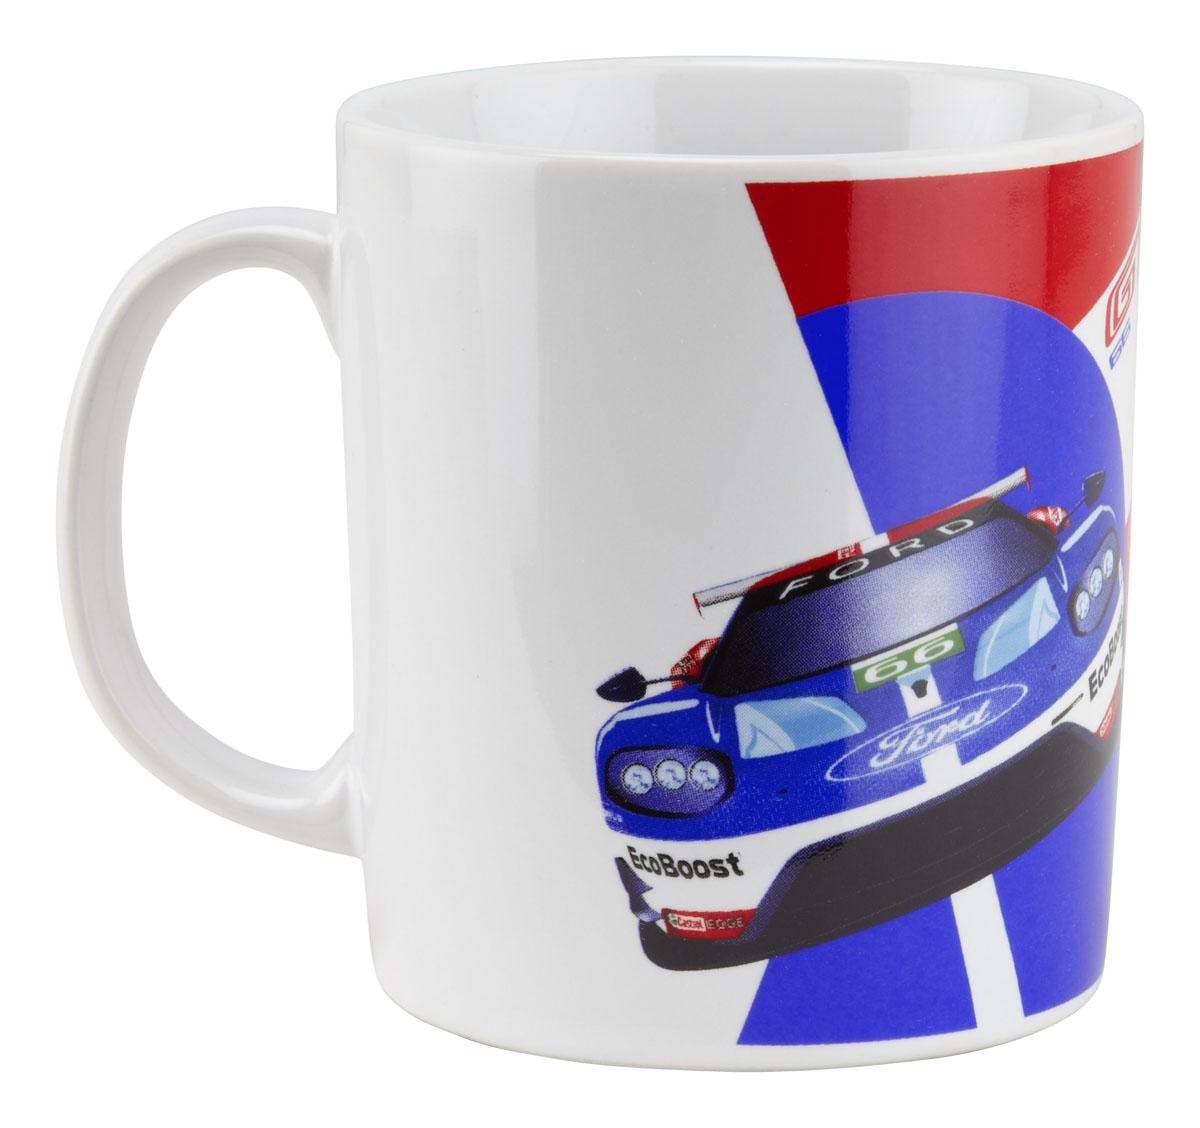 Ford Gt Race Car Coffee Mug  Wec Ford Gt Chip Ganassi Racing Team